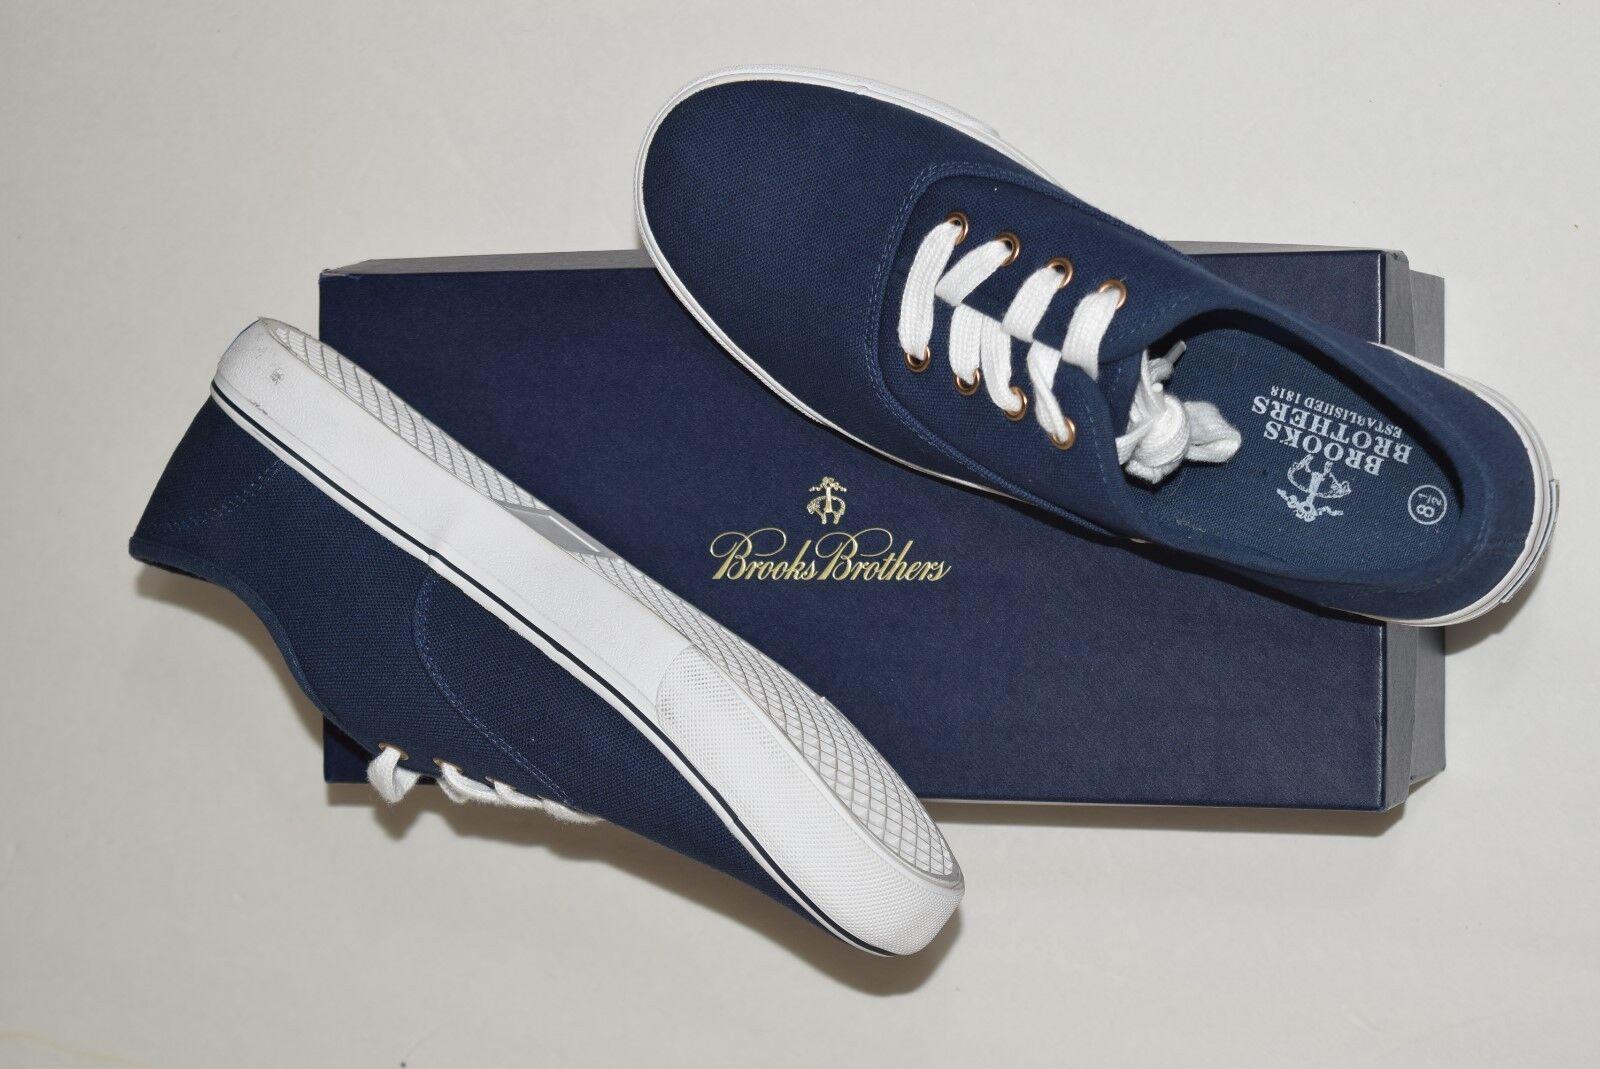 NIB BROOKS BredHERS Size 8.5 Men's Navy 100% Cotton Canvas Tennis shoes Sneaker